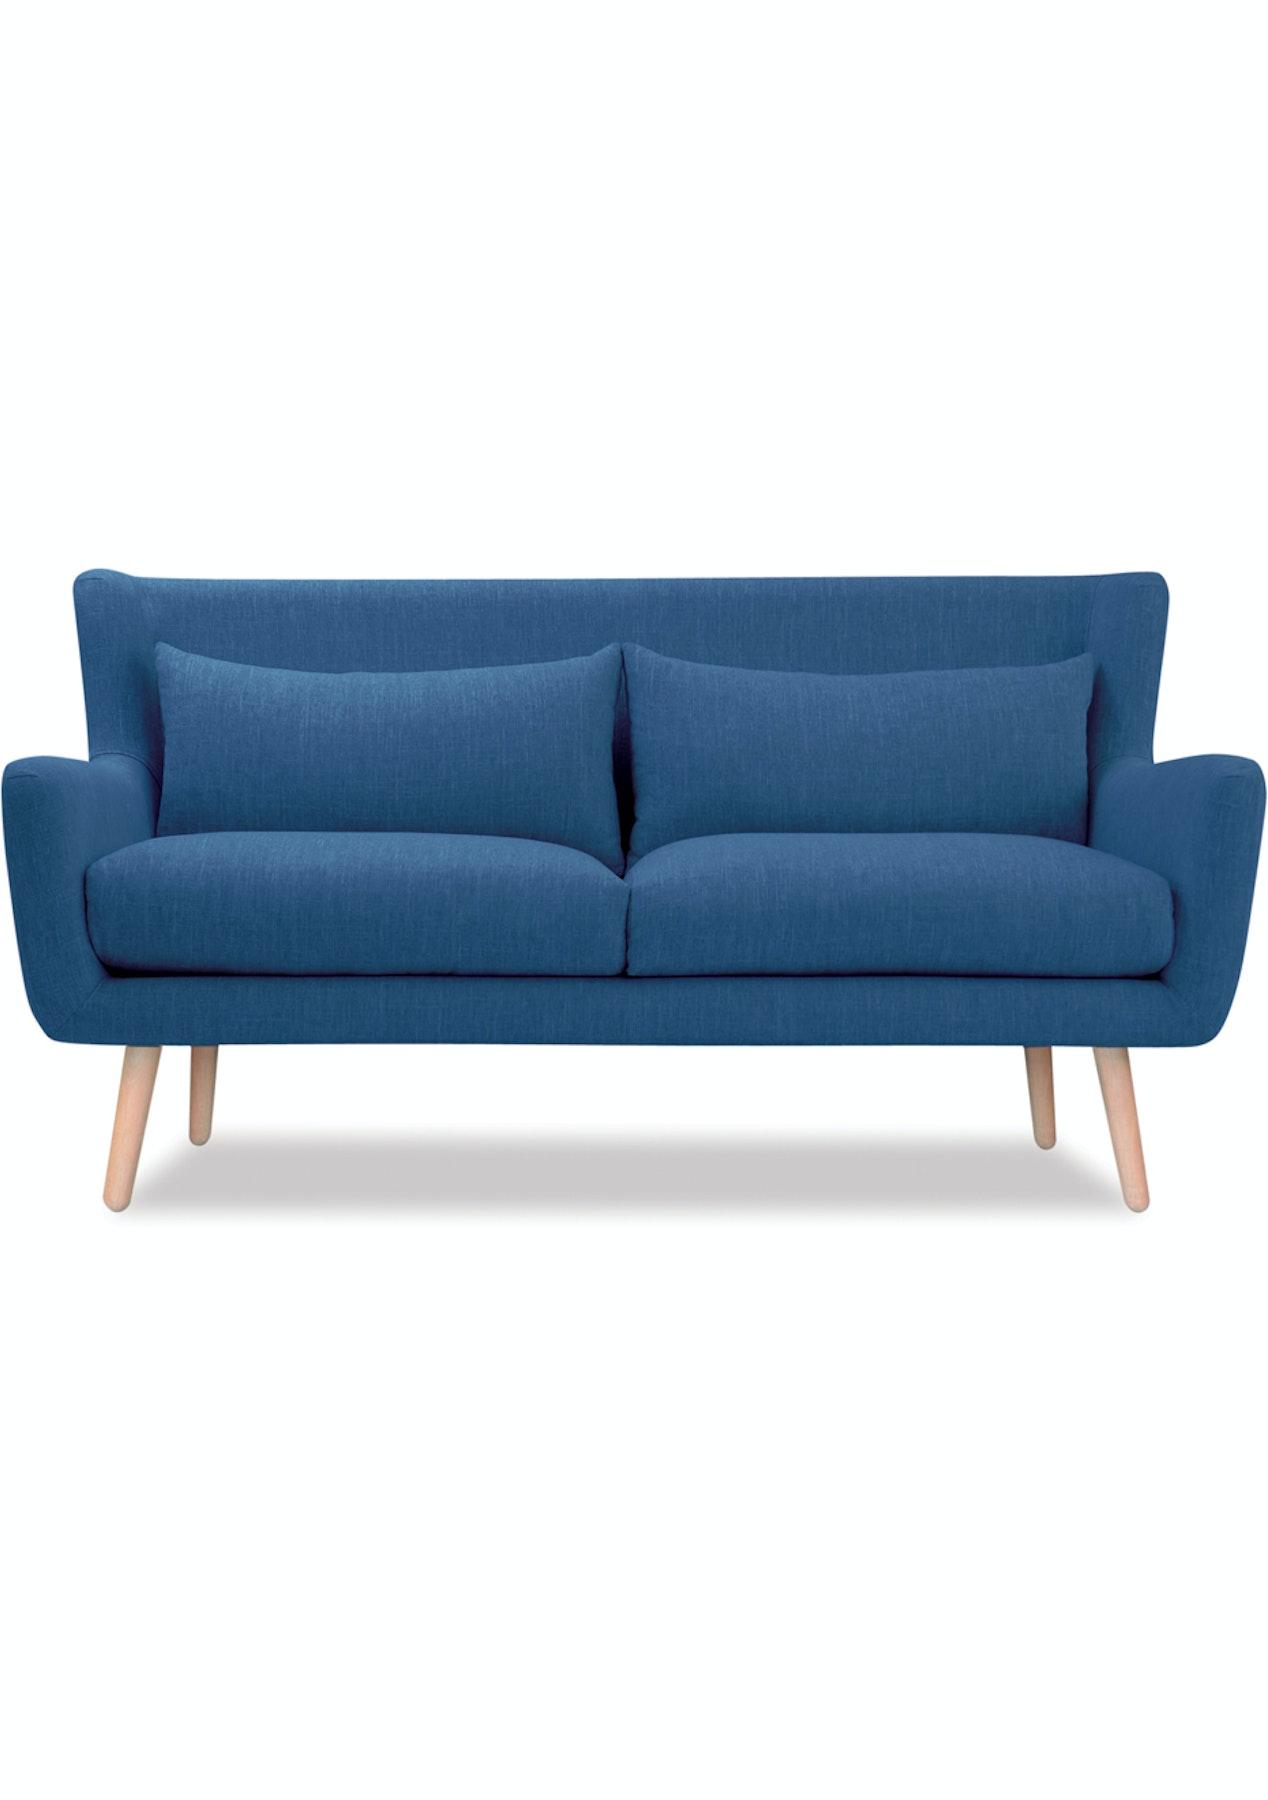 Danske Mobler Nelly 2 Seater Diego Petrol Blue Big Furniture